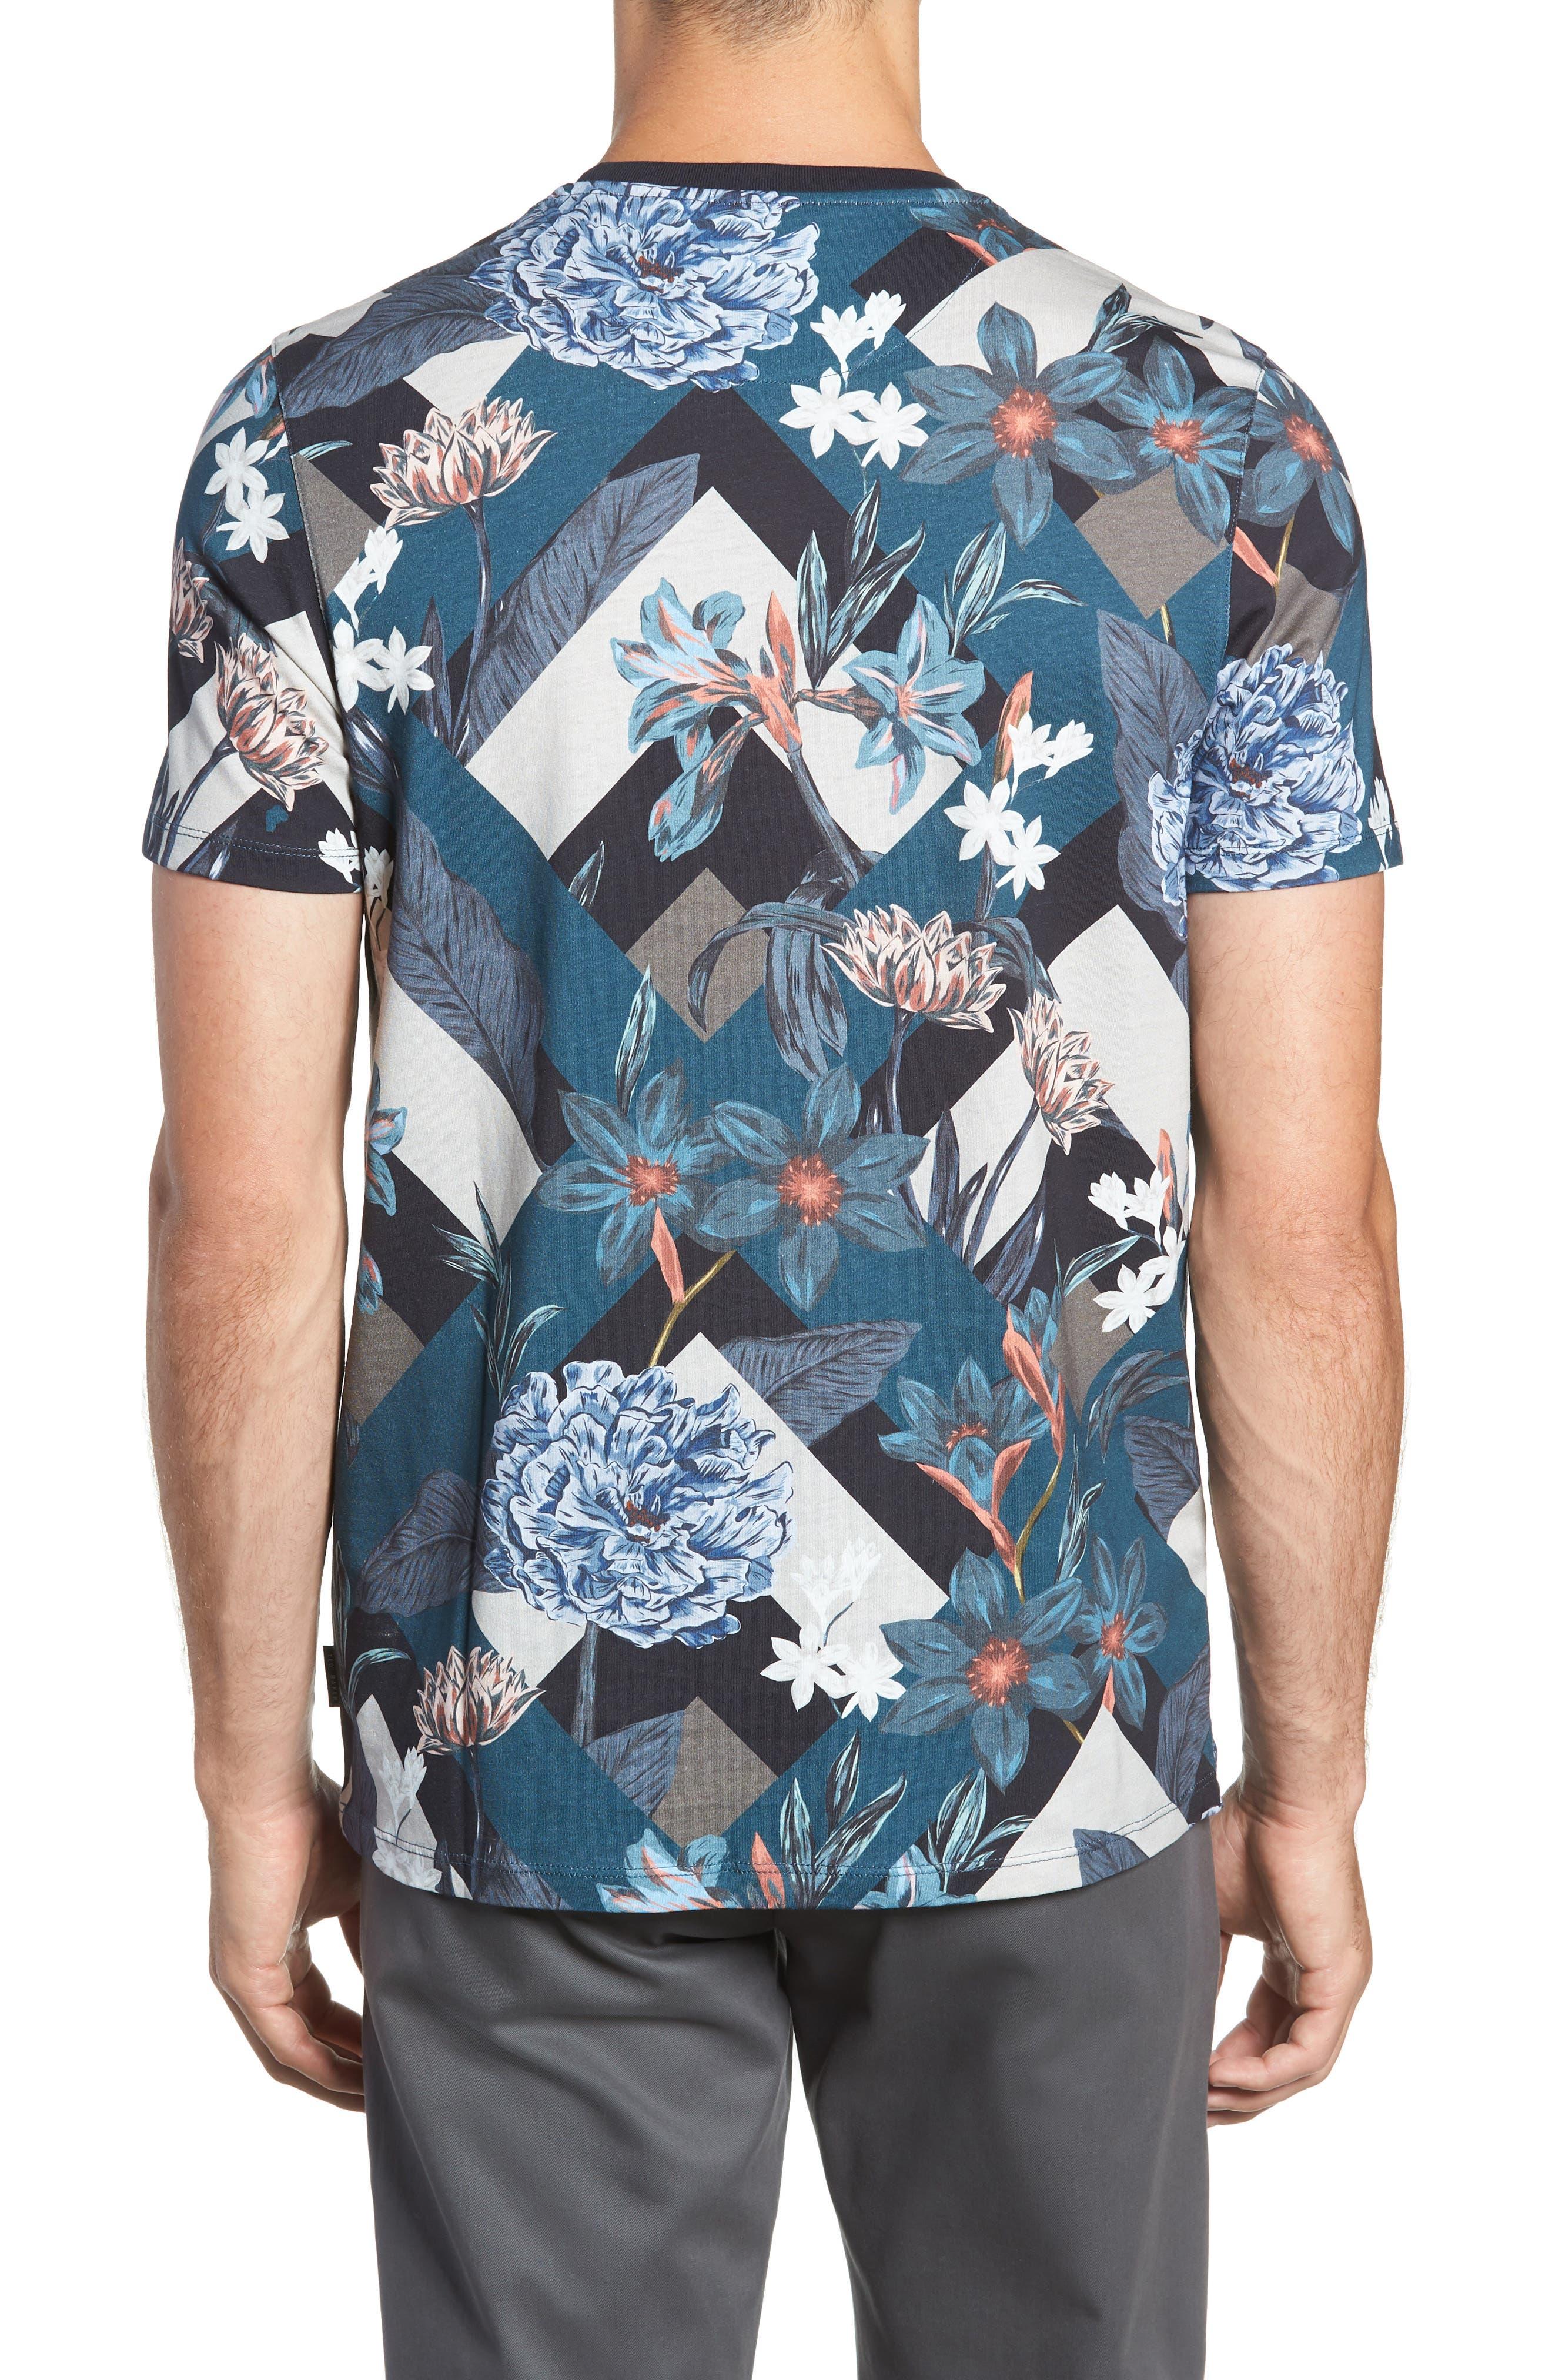 Jolly Slim Fit T-Shirt,                             Alternate thumbnail 2, color,                             NAVY